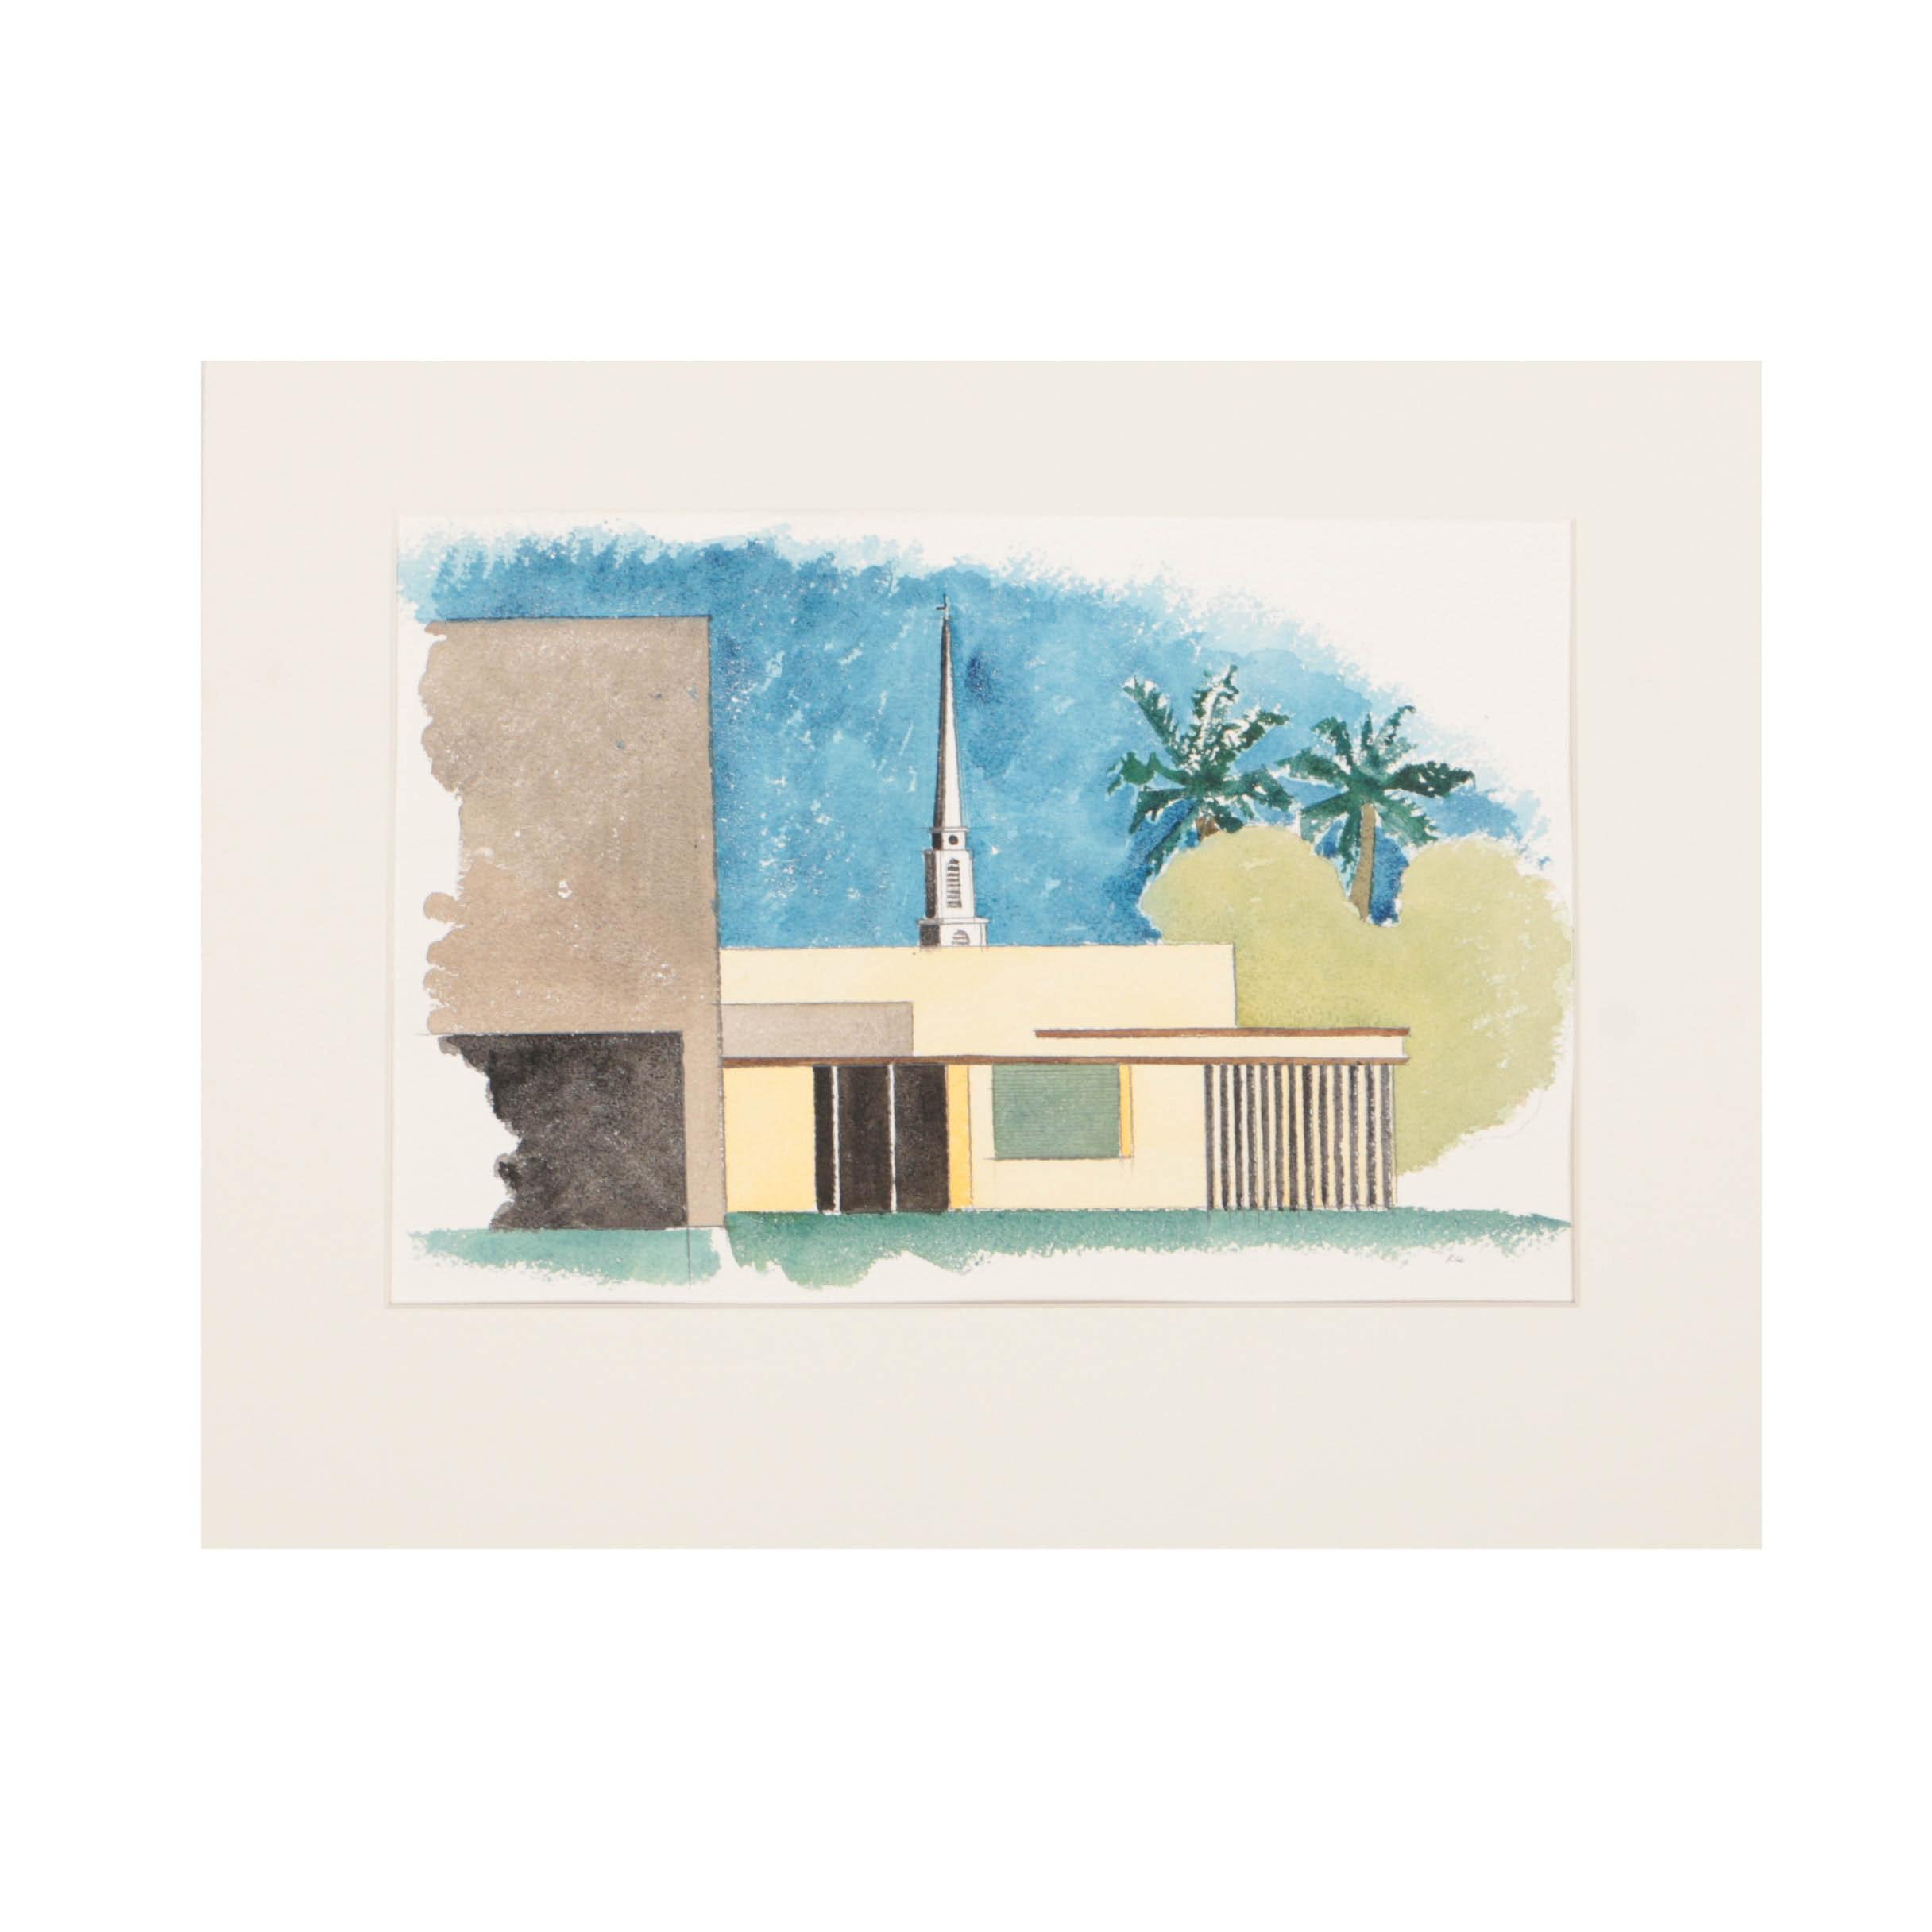 Robert Herrmann Watercolor on Paper Architectural Landscape